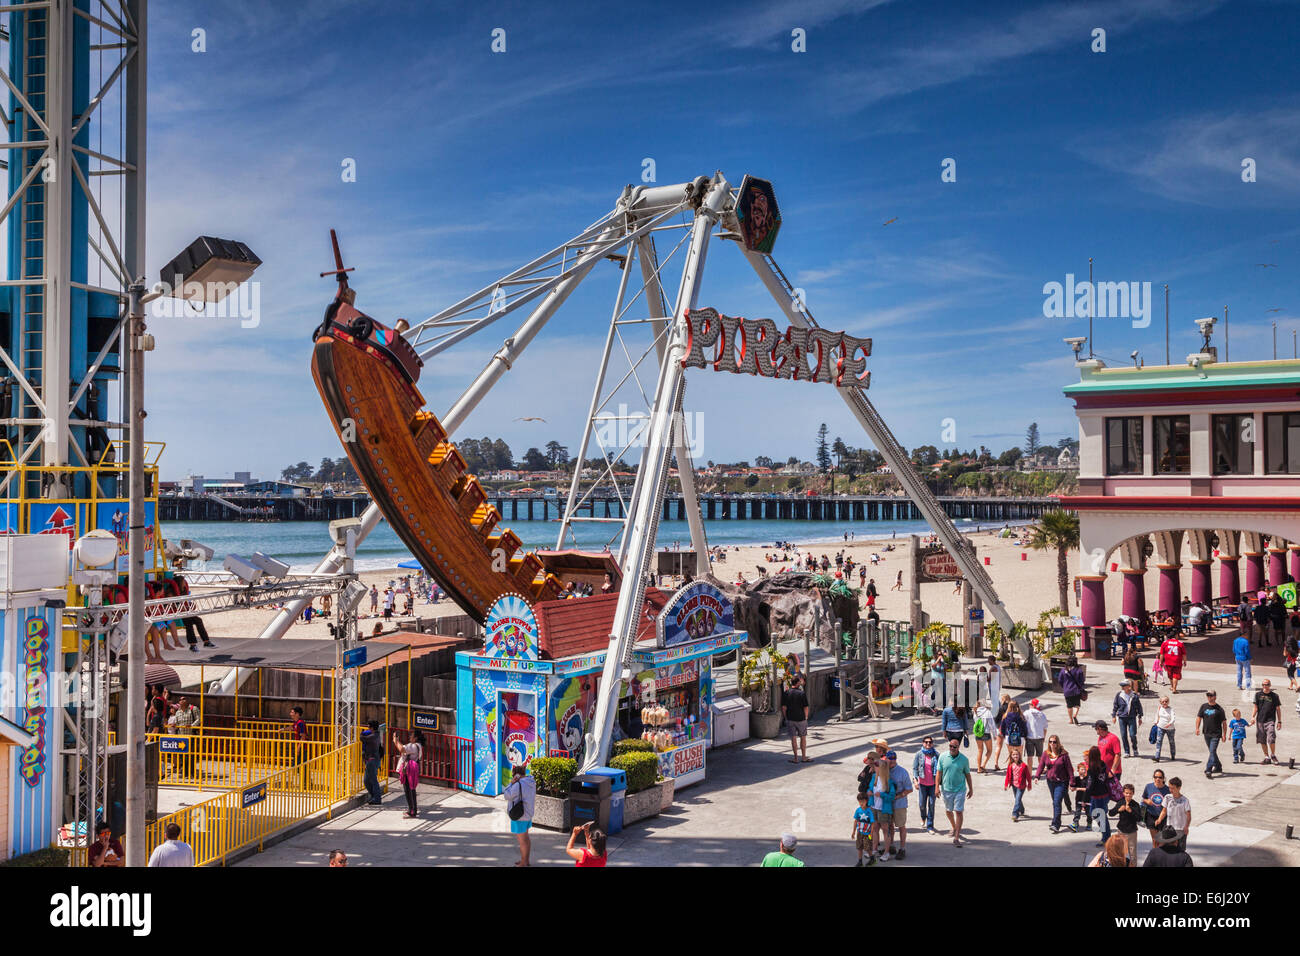 Pirate Ship at Santa Cruz Boardwalk, California, USA. - Stock Image